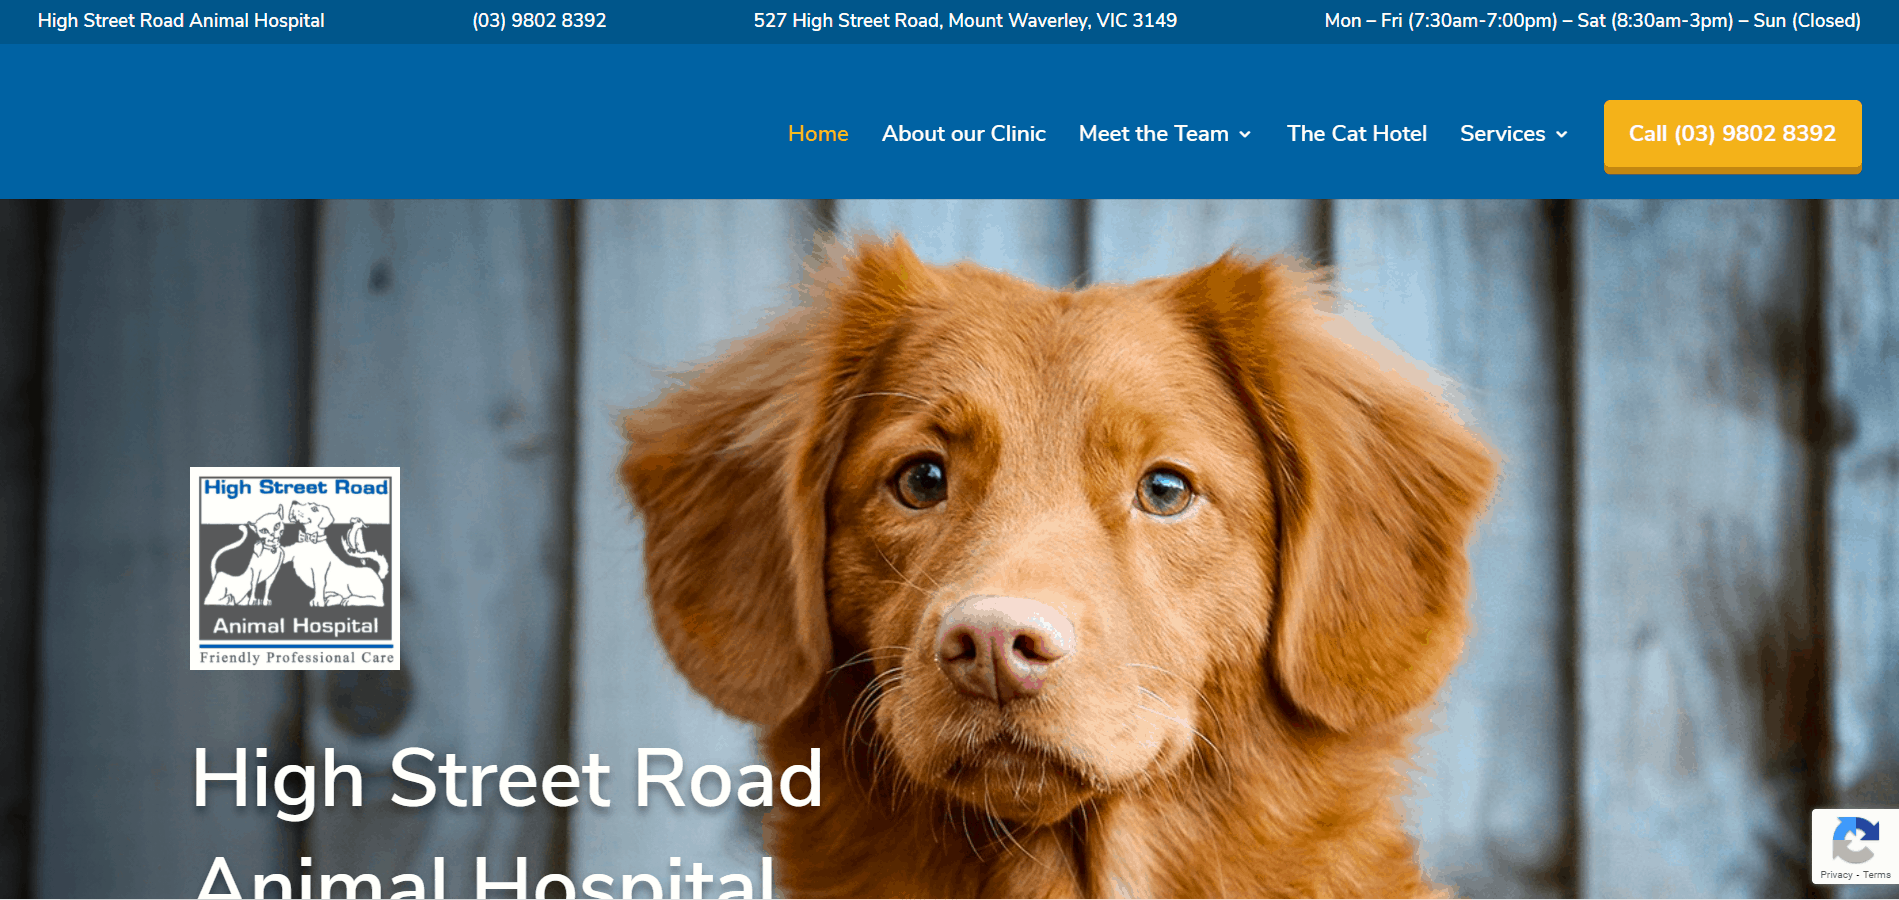 High Street Road Animal Hospital